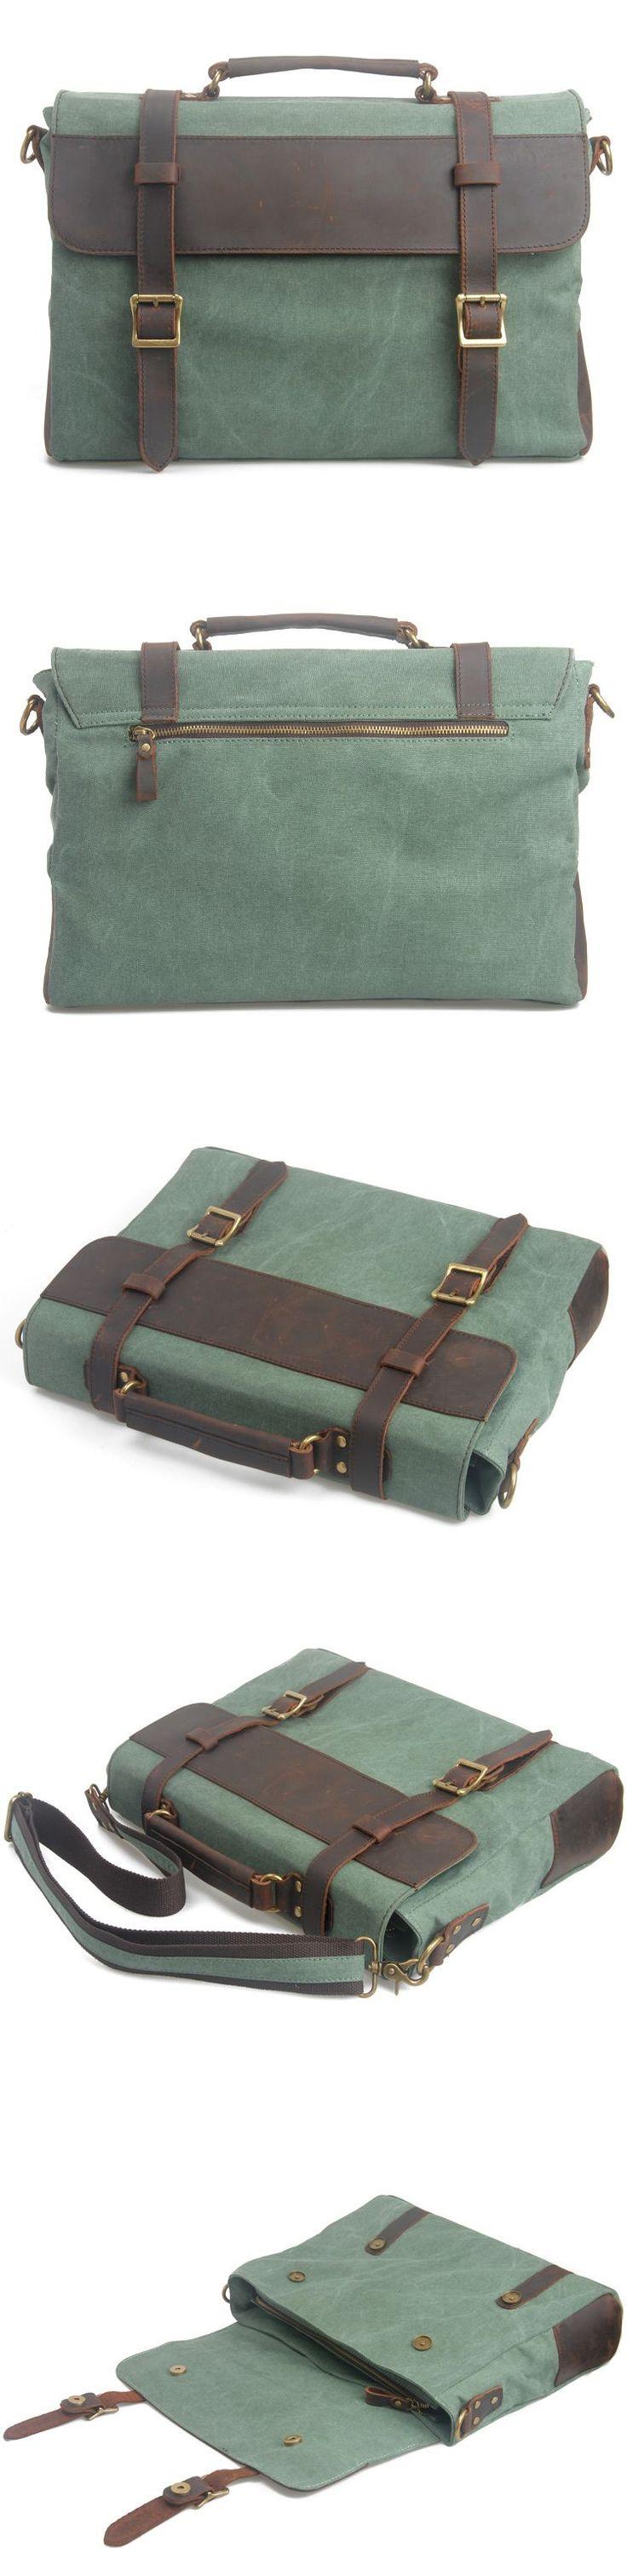 Handmade Vintage Crazy Horse Leather Canvas Single Shoulder Bags / Messager Bags / Briefcase / 14' 15' MacBook Laptop Bags (m6870-1) · Handm...